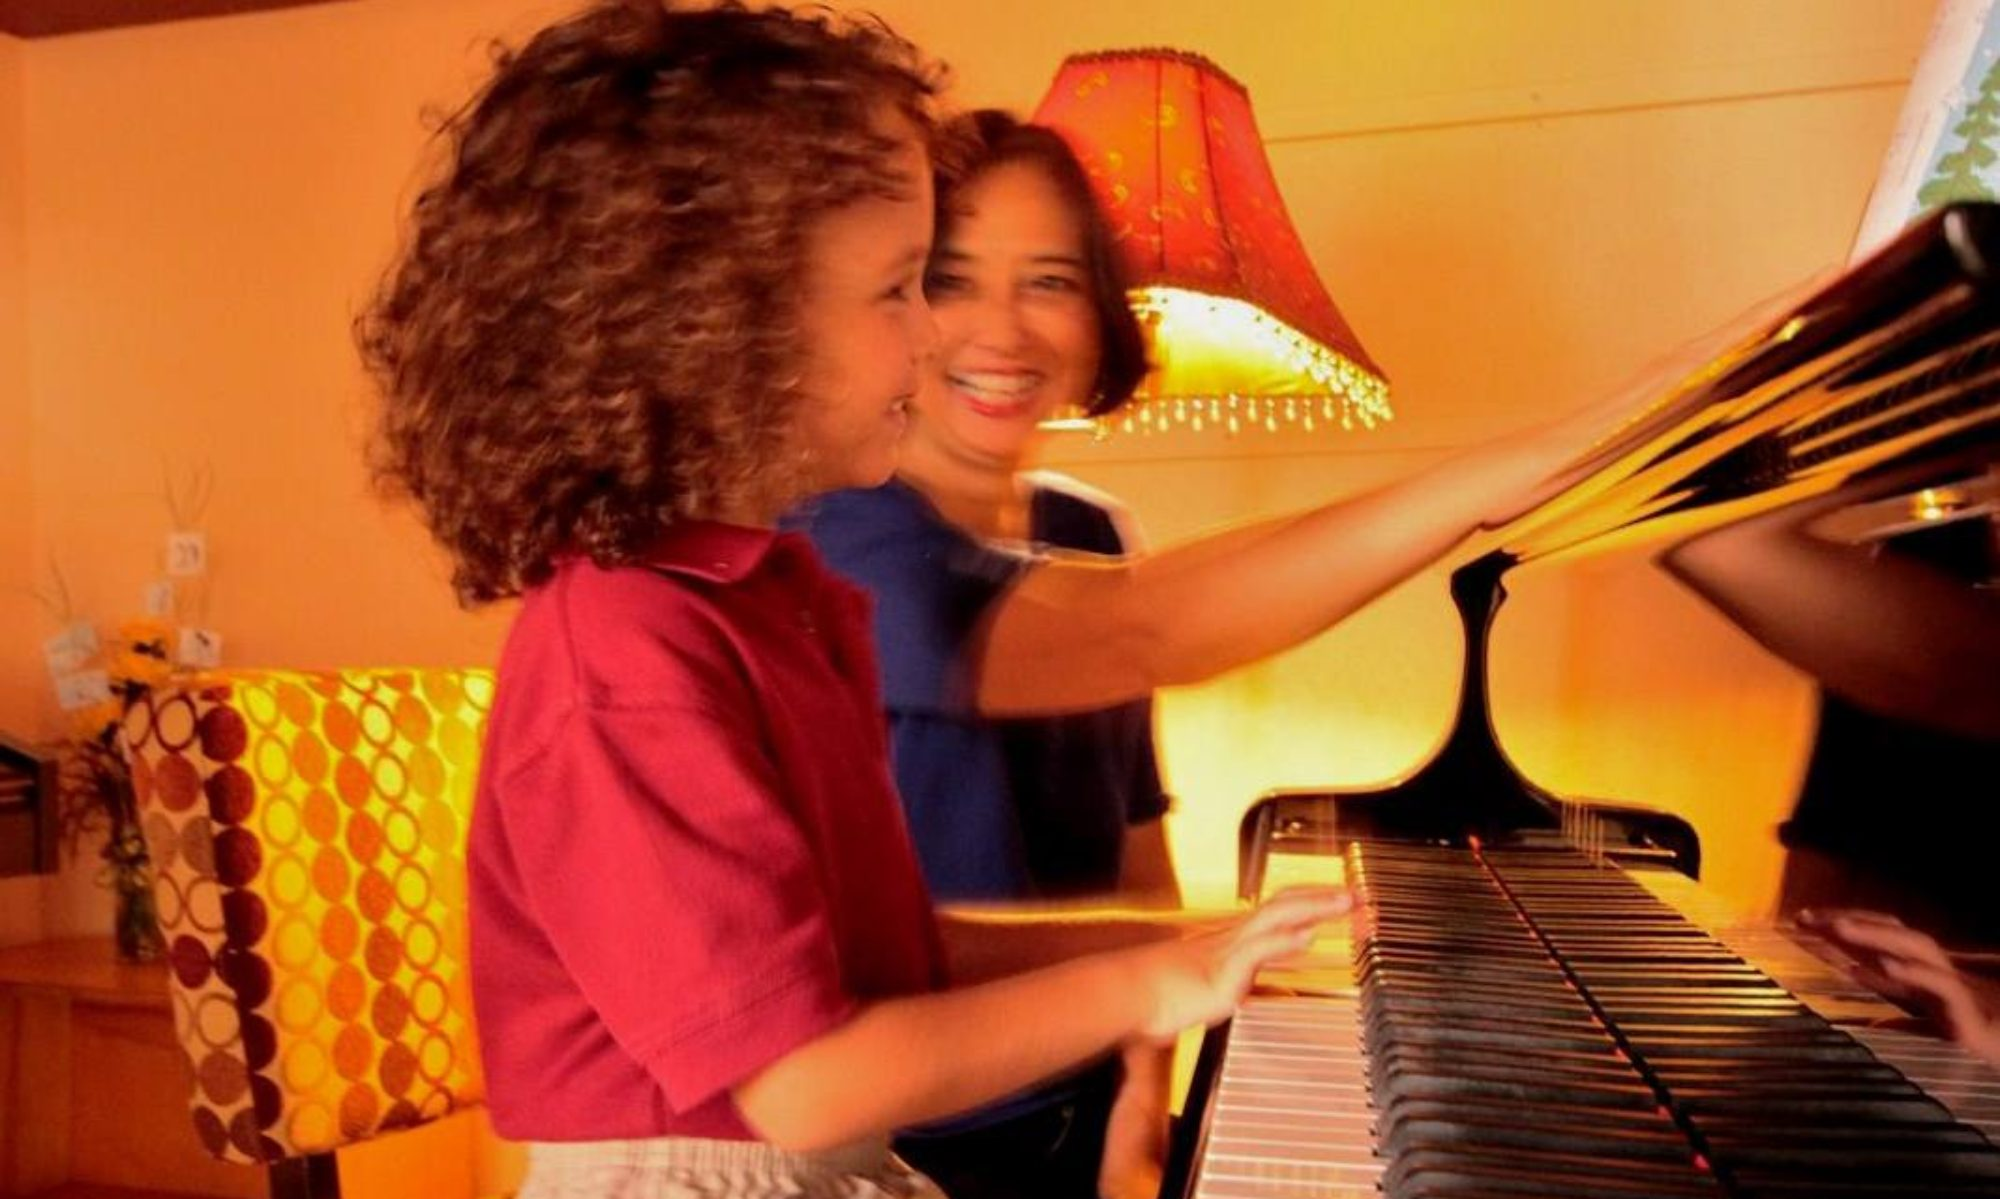 Manoa School of Music & the Arts